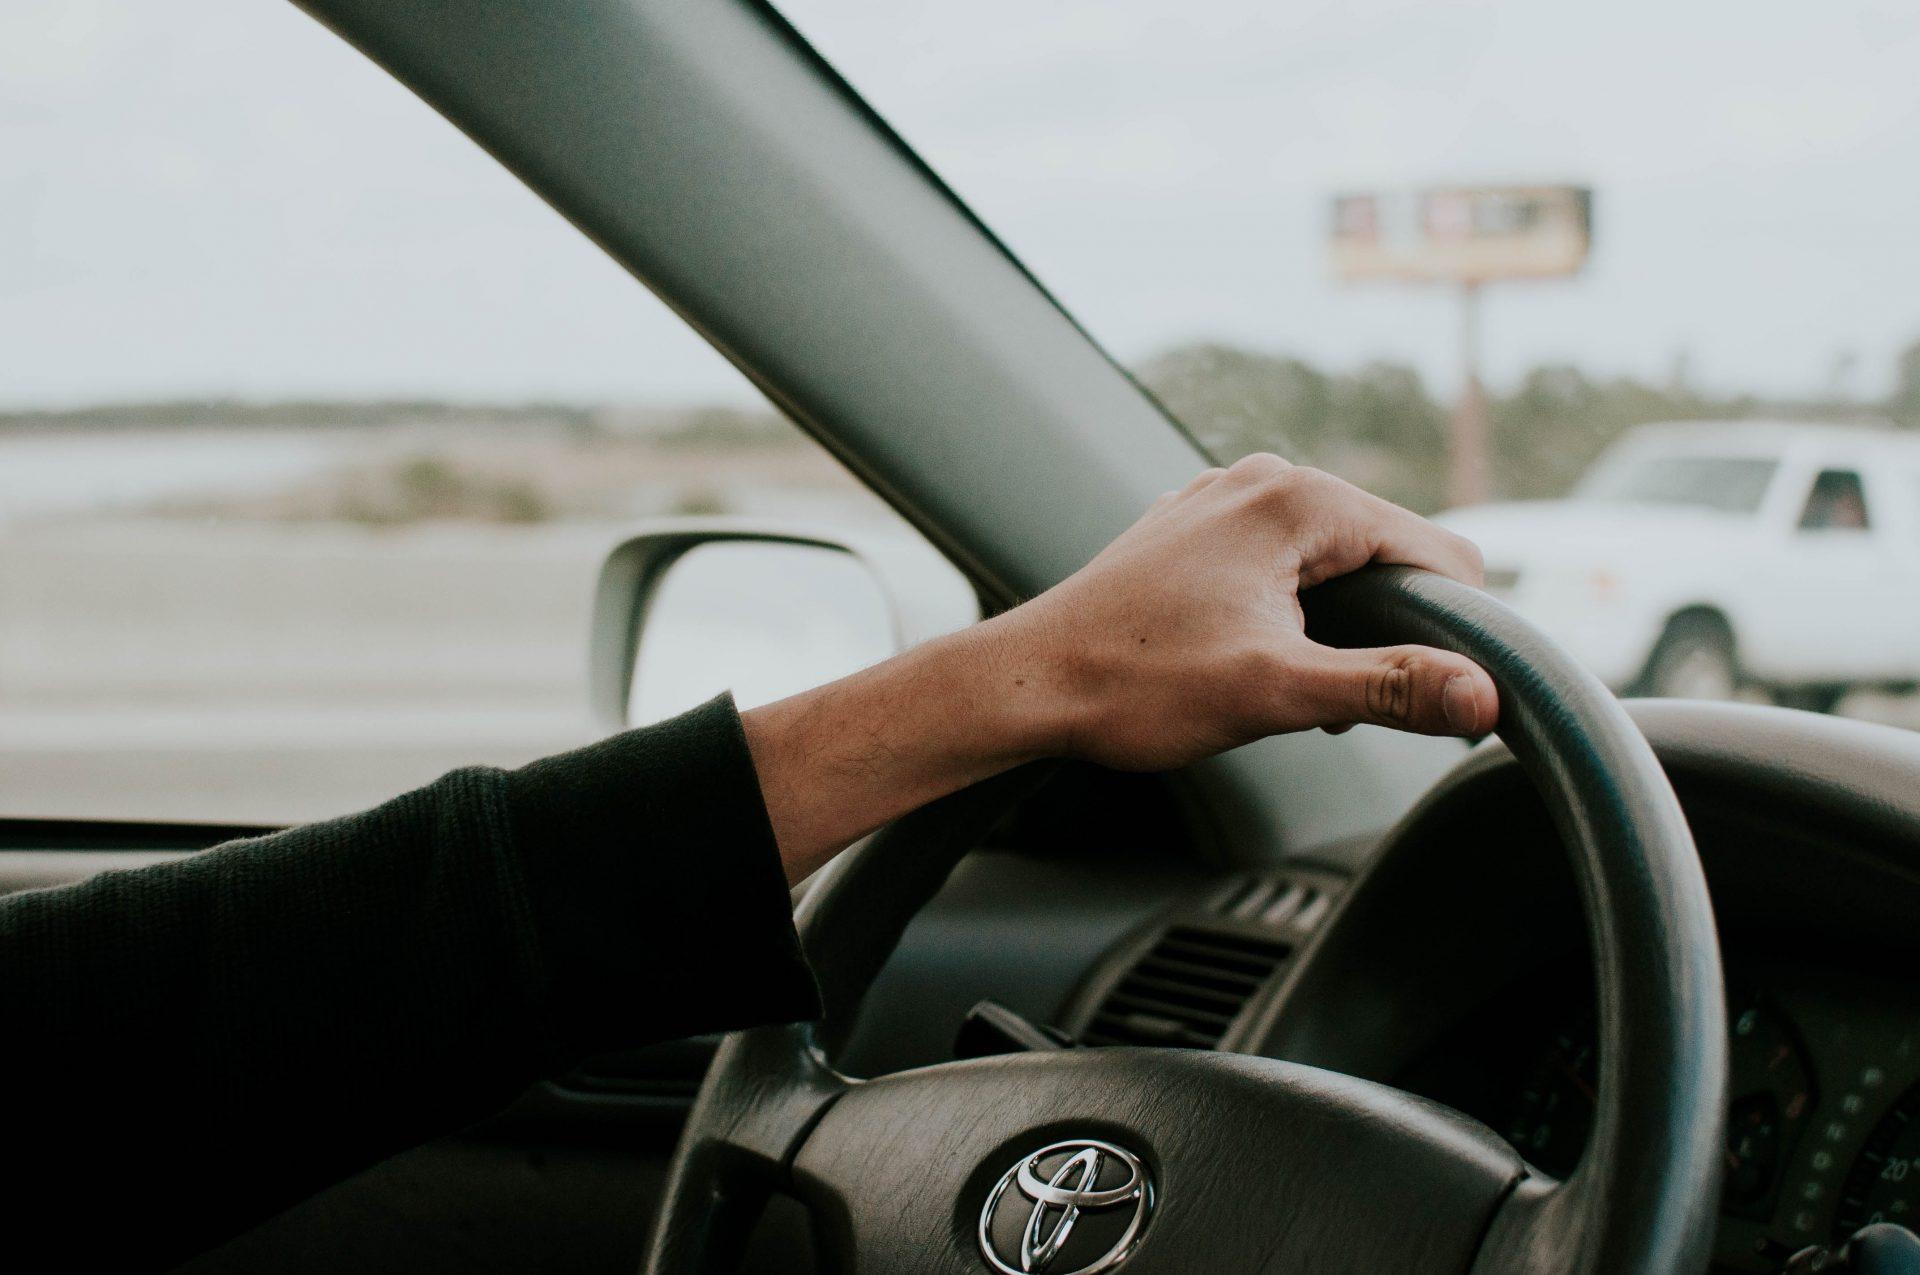 【NY運転免許取得への道④】アメリカの自動車教習所で5時間講習を受講(5 Hour Pre Licensing Course)